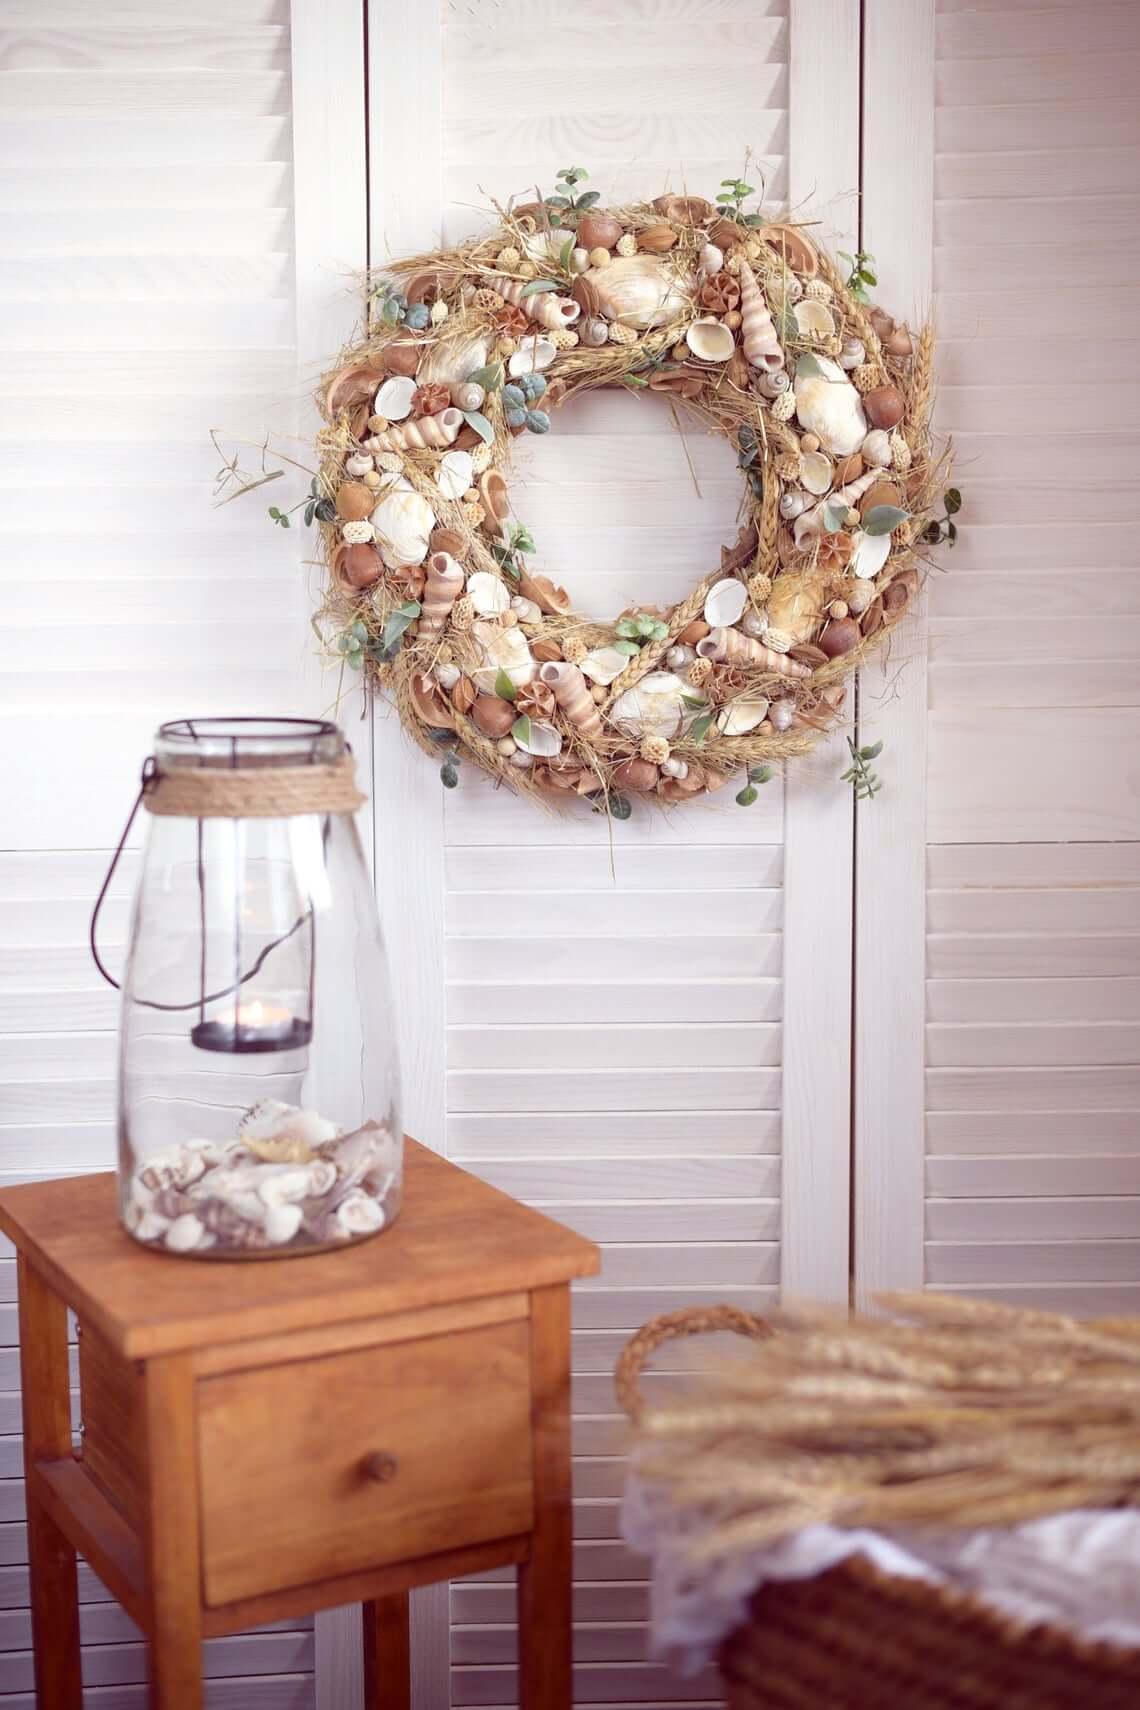 Splendid Seashell, Plumes, and Greenery DIY Wreath